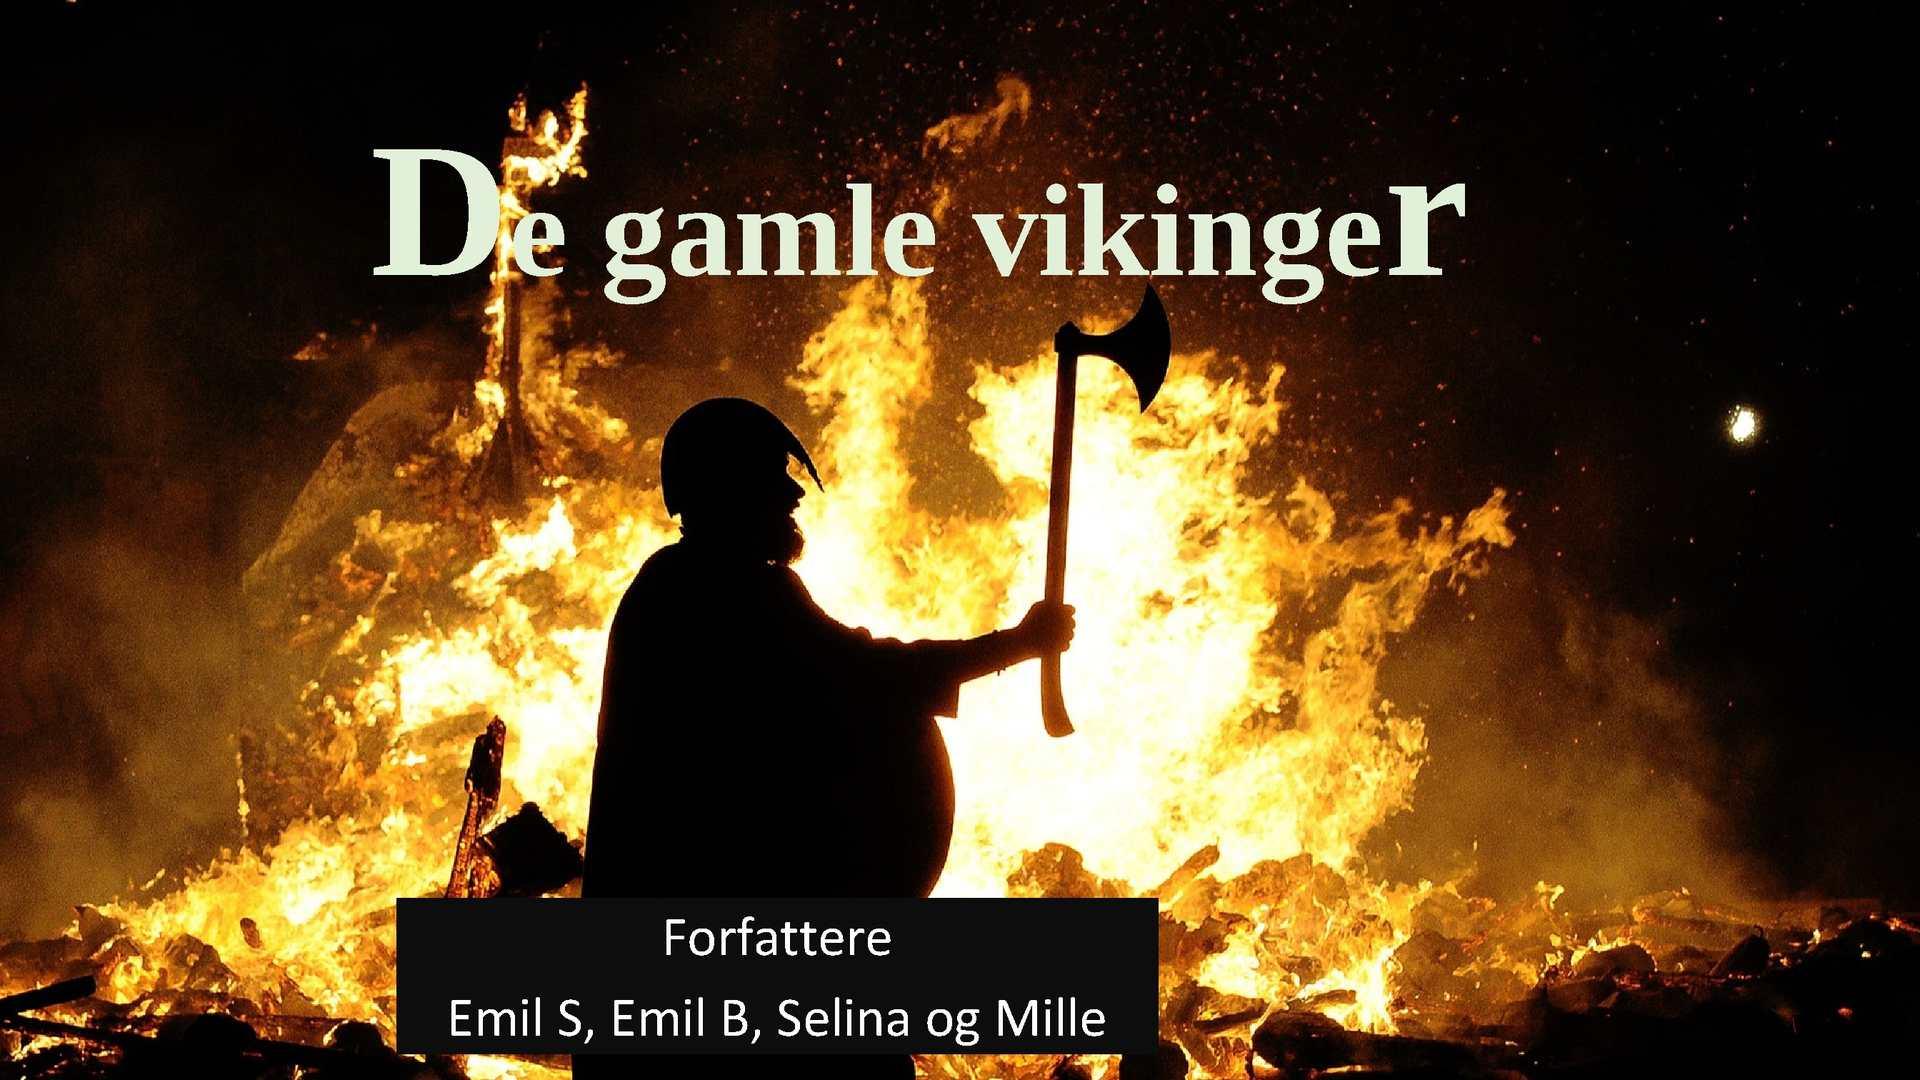 Calaméo - De gamle vikinger